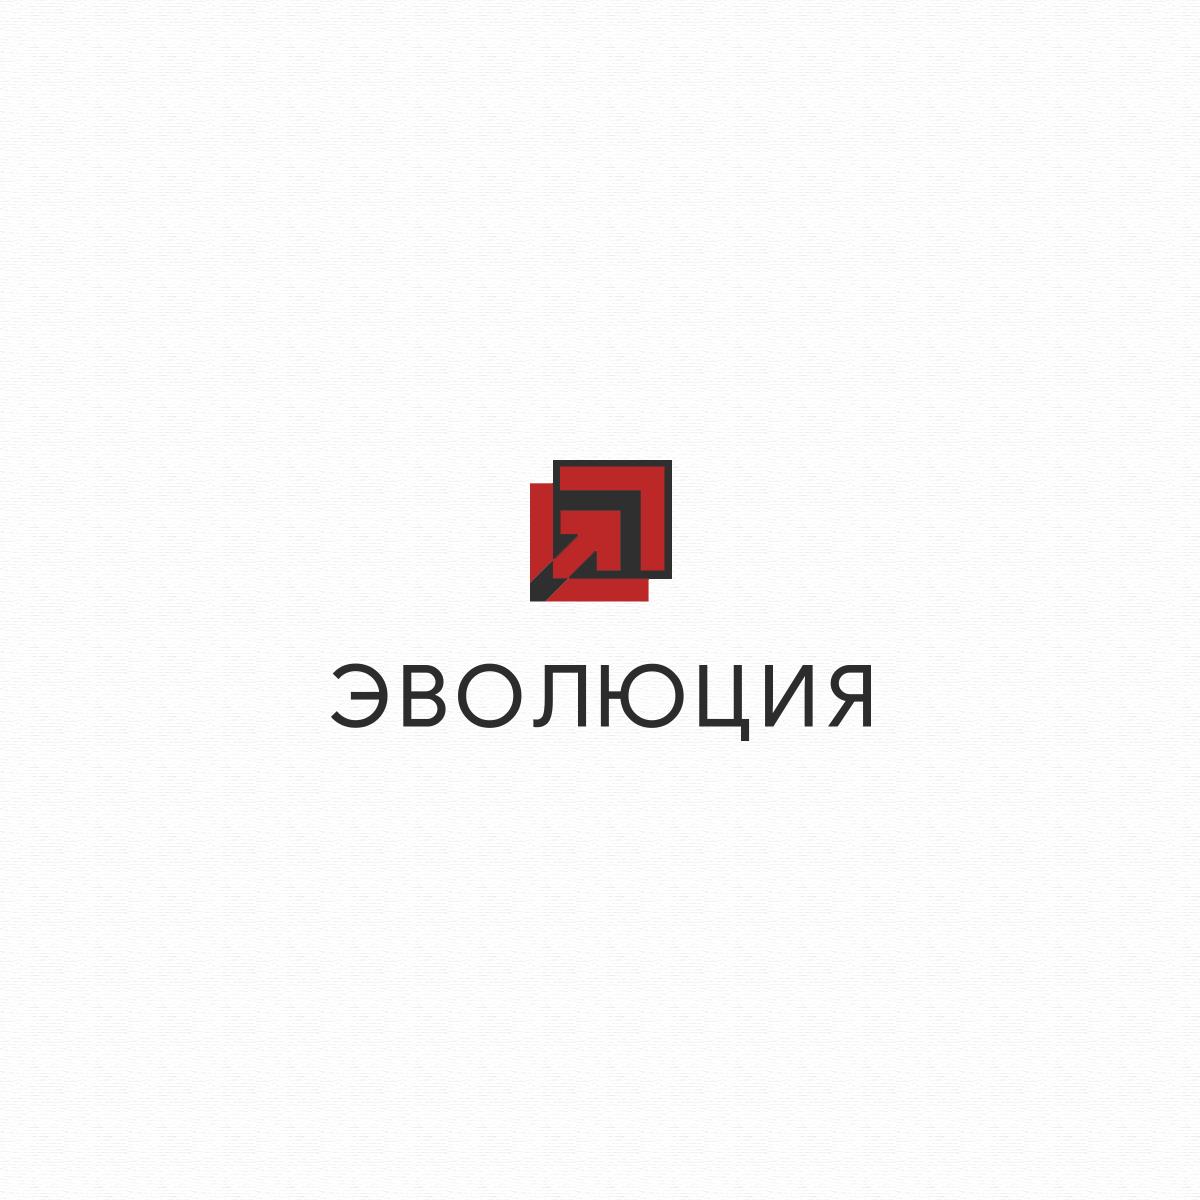 Разработать логотип фото f_8415bc9ee947221c.jpg